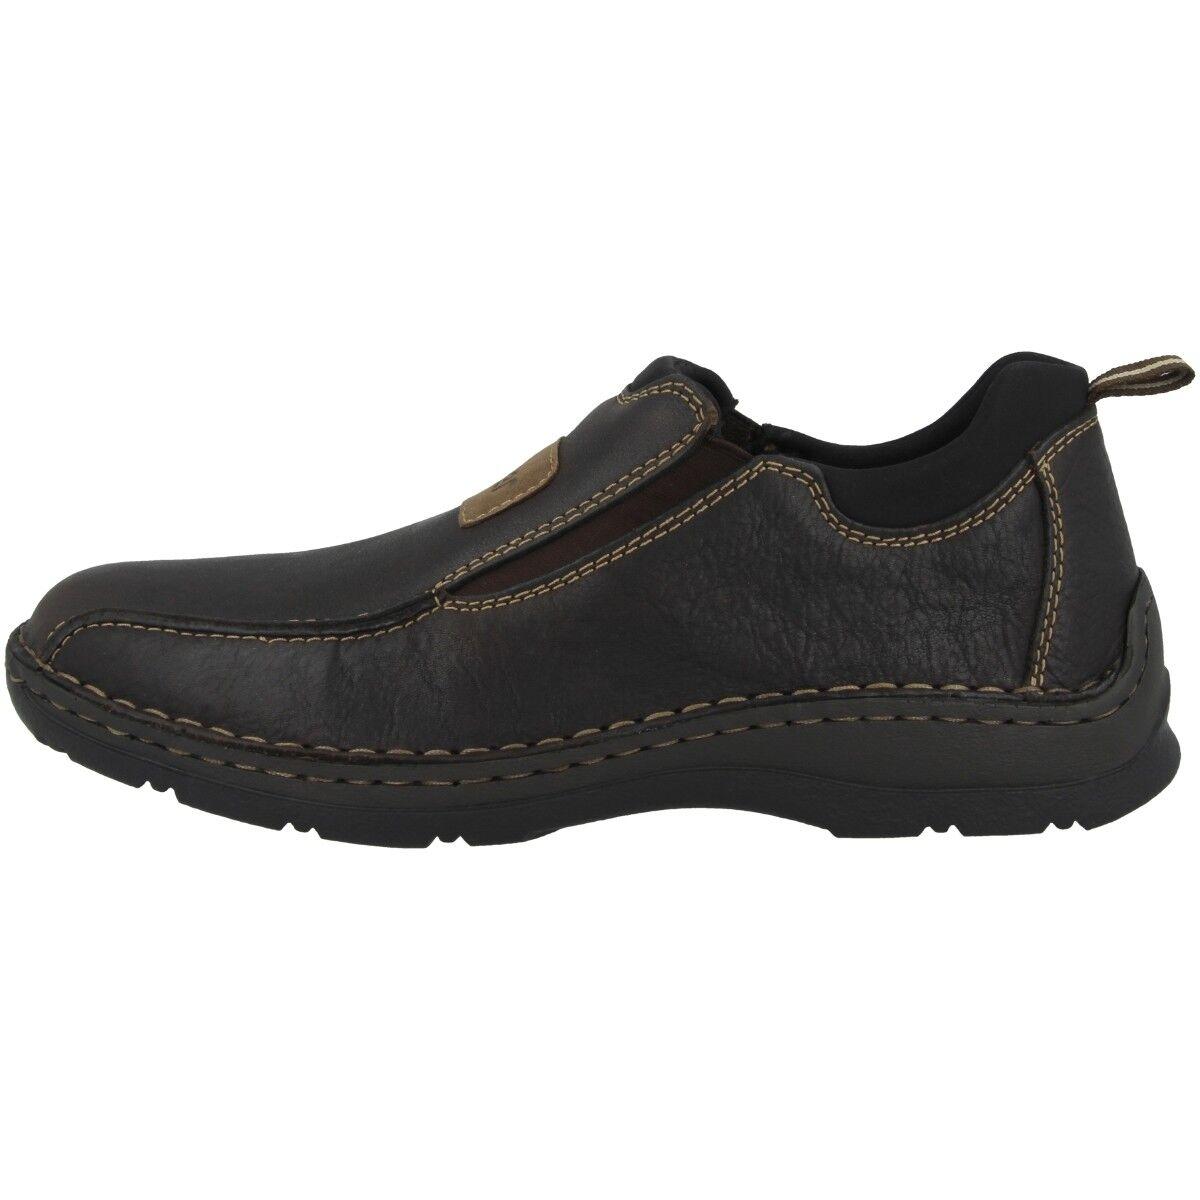 Rieker Michigan-Velvet-Scuba Men Schuhe Herren Halbschuhe Slipper brown 05363-25